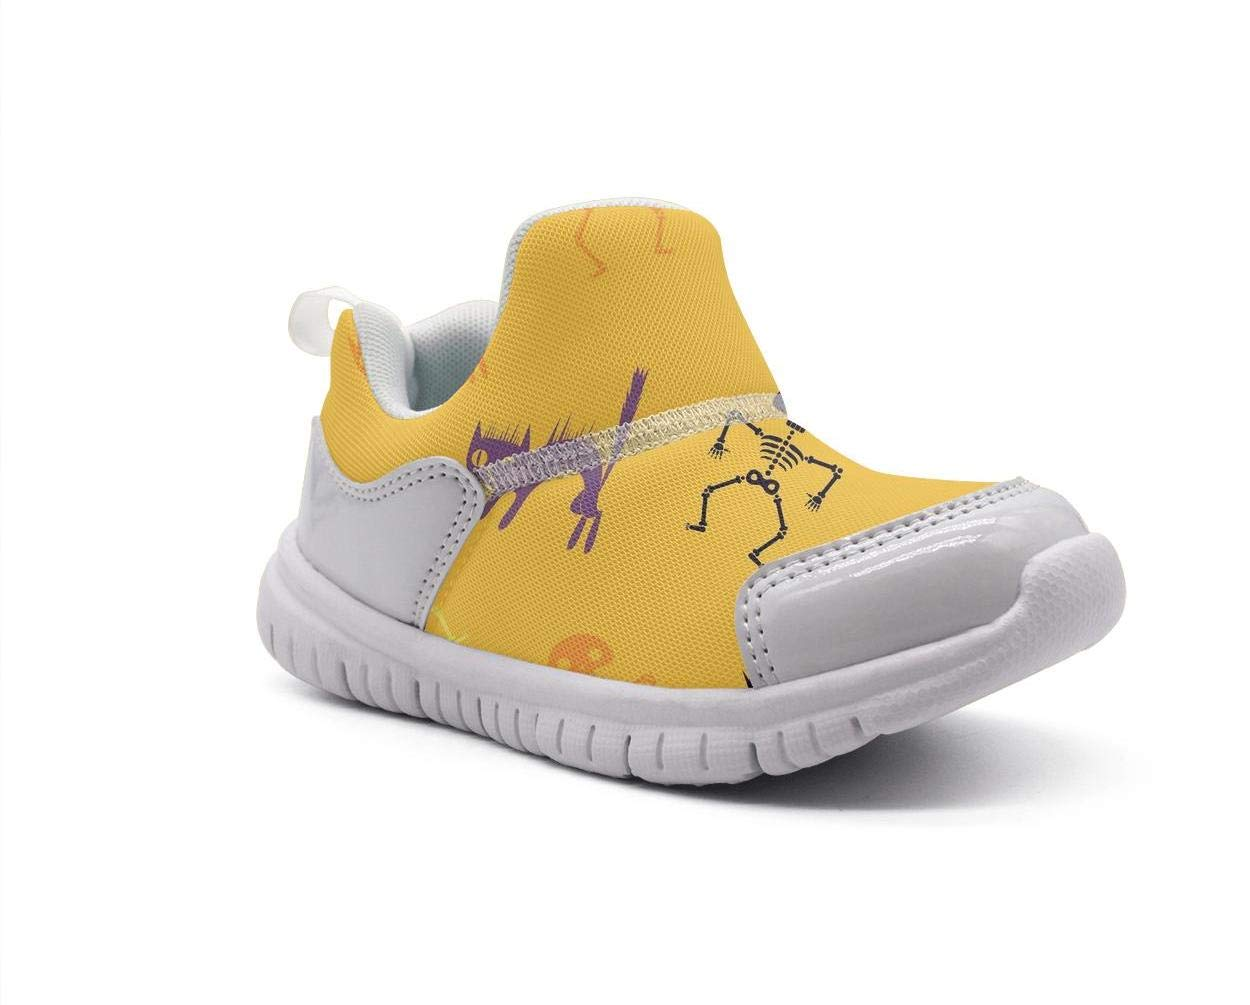 ONEYUAN Children Halloween Skeleton cat Yellow Kid Casual Lightweight Sport Shoes Sneakers Walking Athletic Shoes